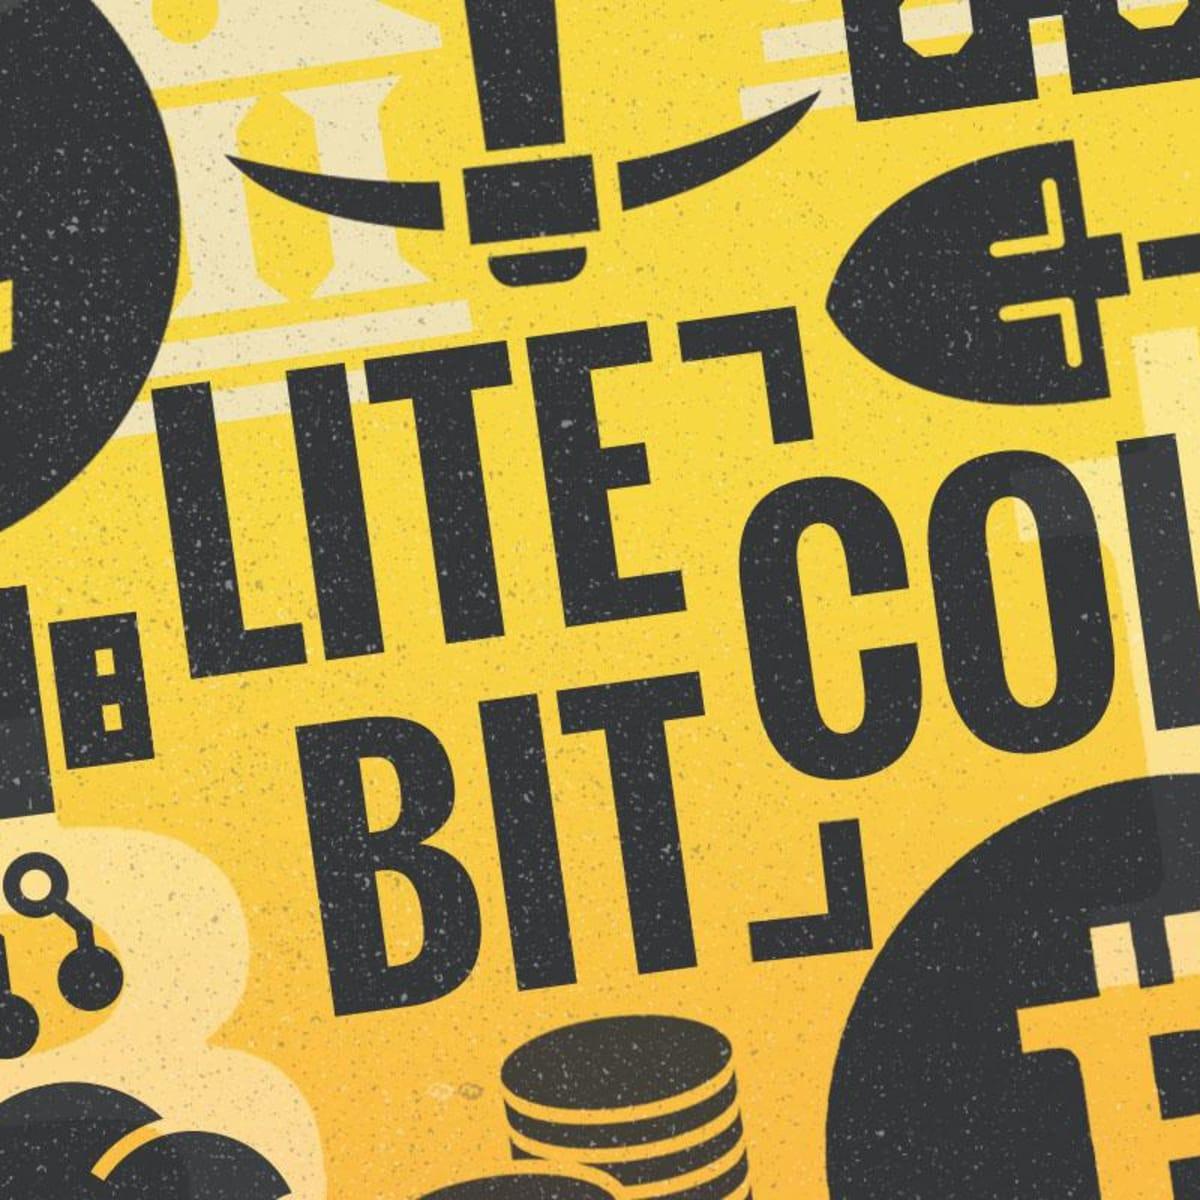 litecoin díjak vs bitcoin